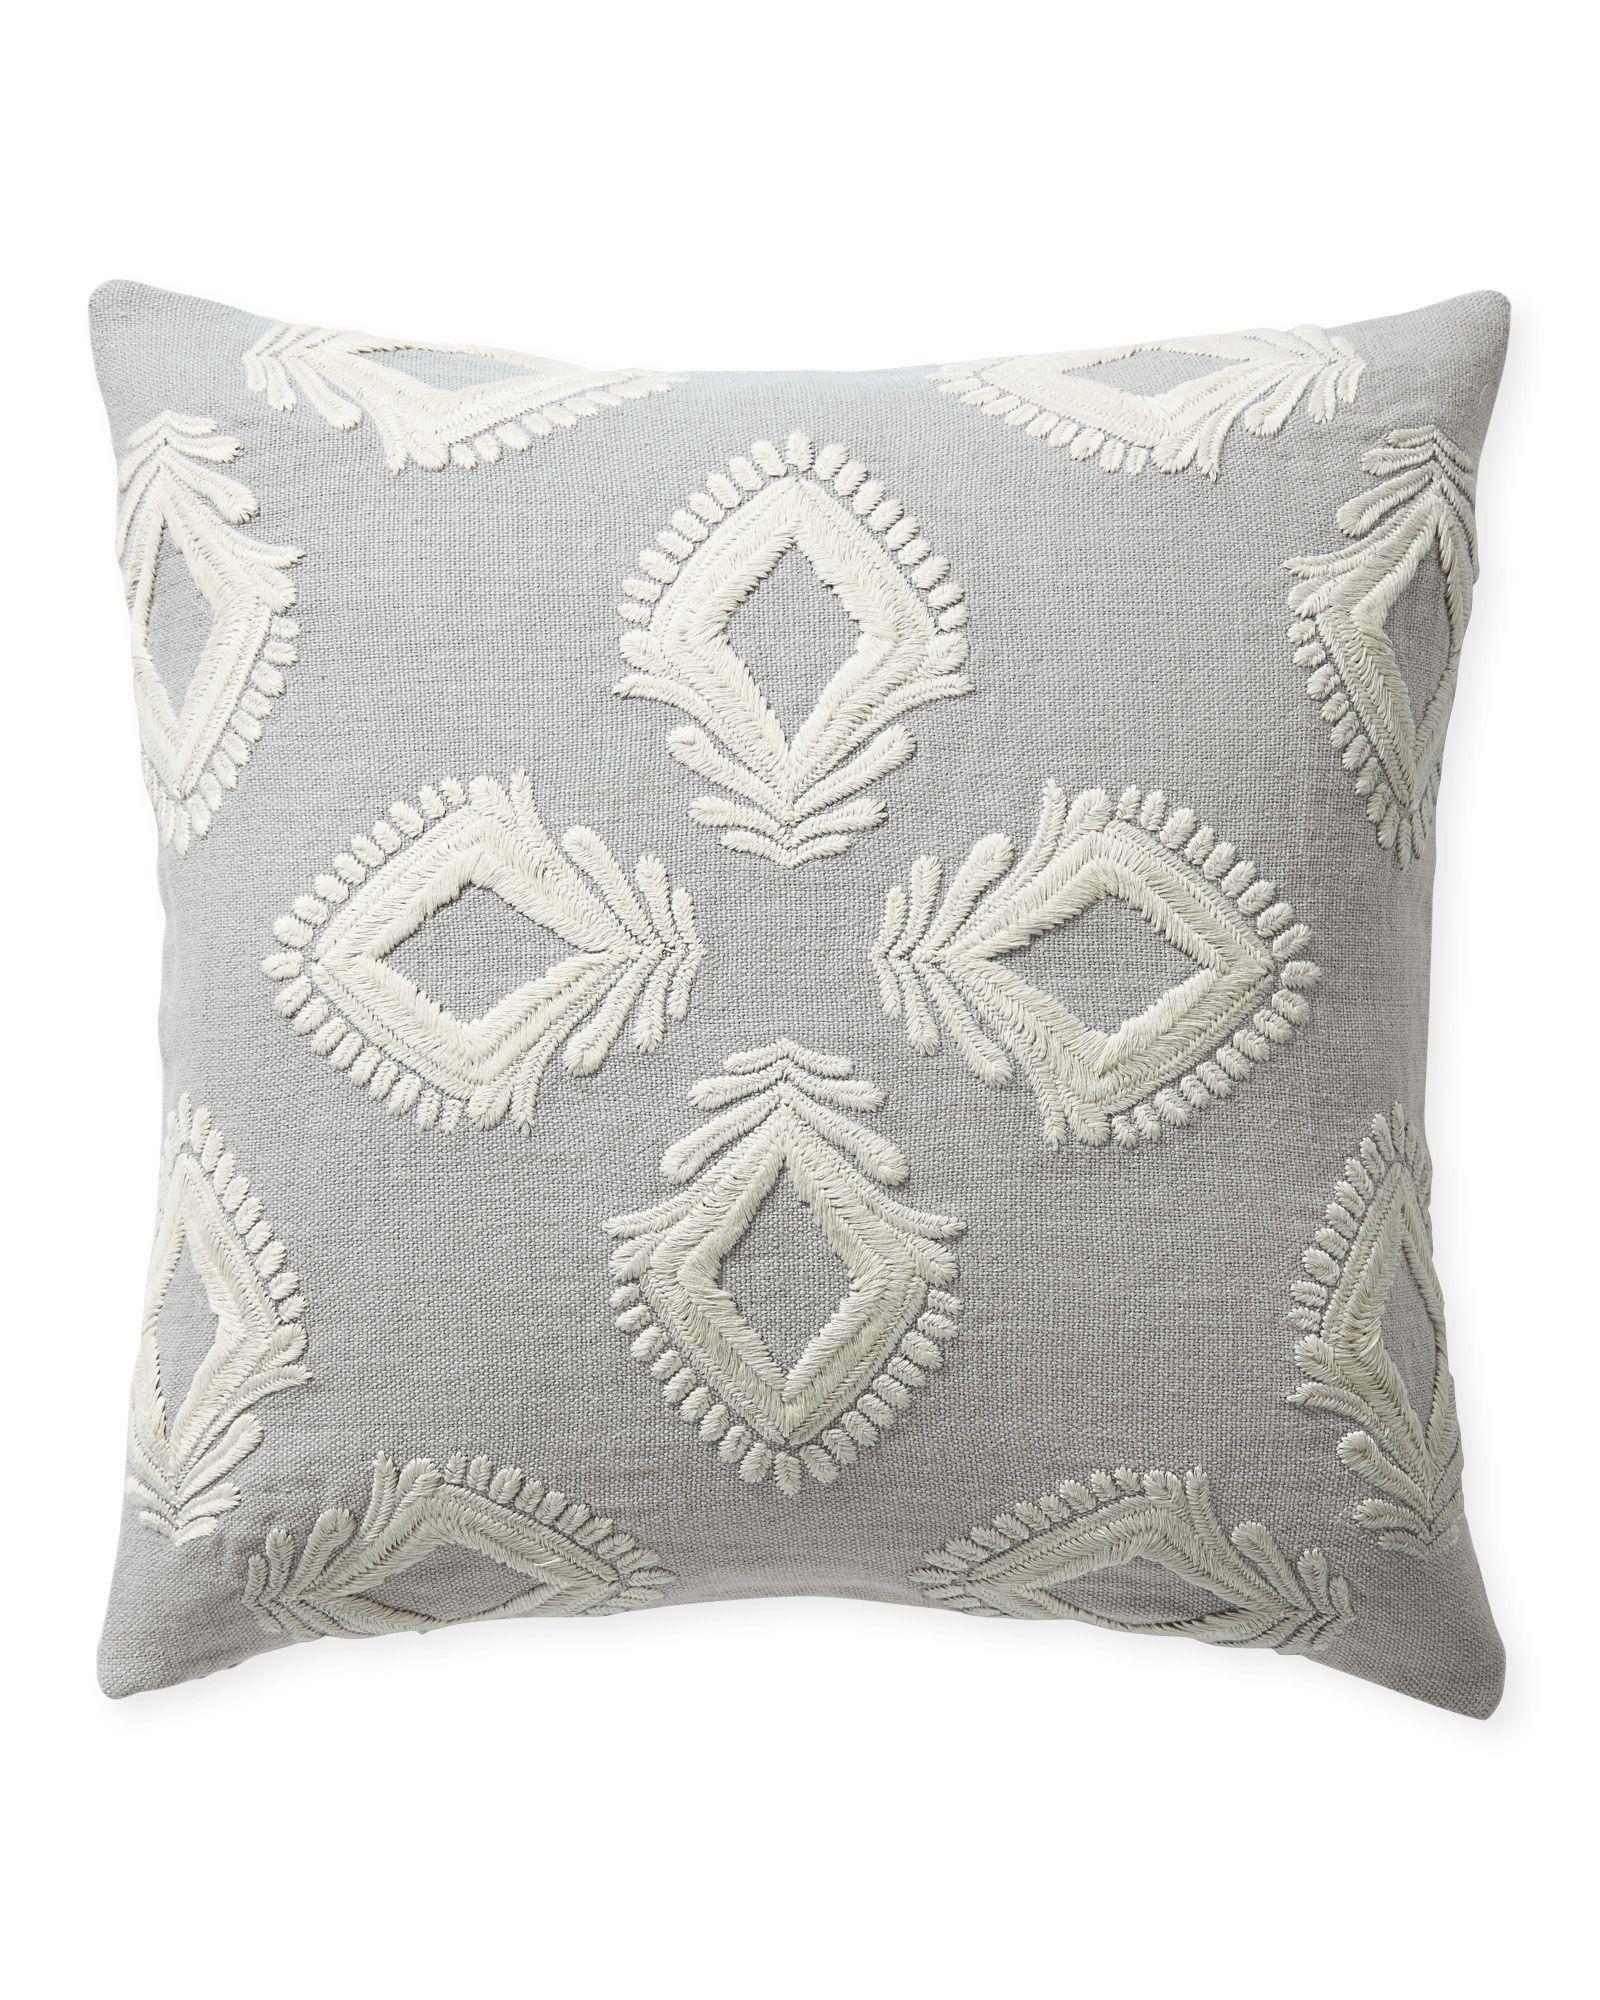 Leighton Pillow Cover Pillows West Elm Pillows Throw Pillows